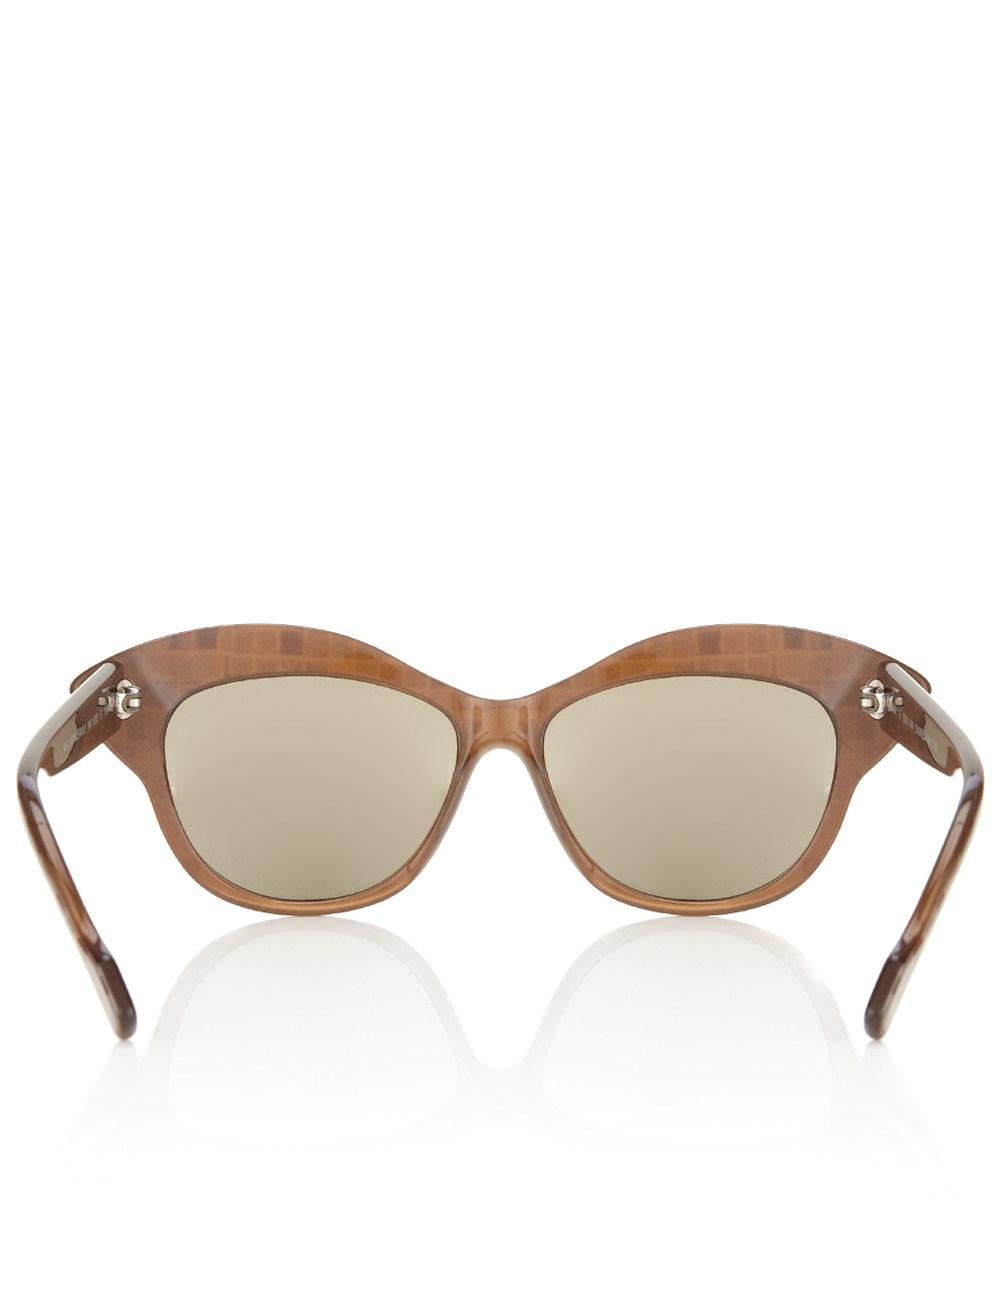 b8e0a26c526a Brown Mosaic Cat-Eye Sunglasses | Wunderkind Brown Mosaic Cat ...